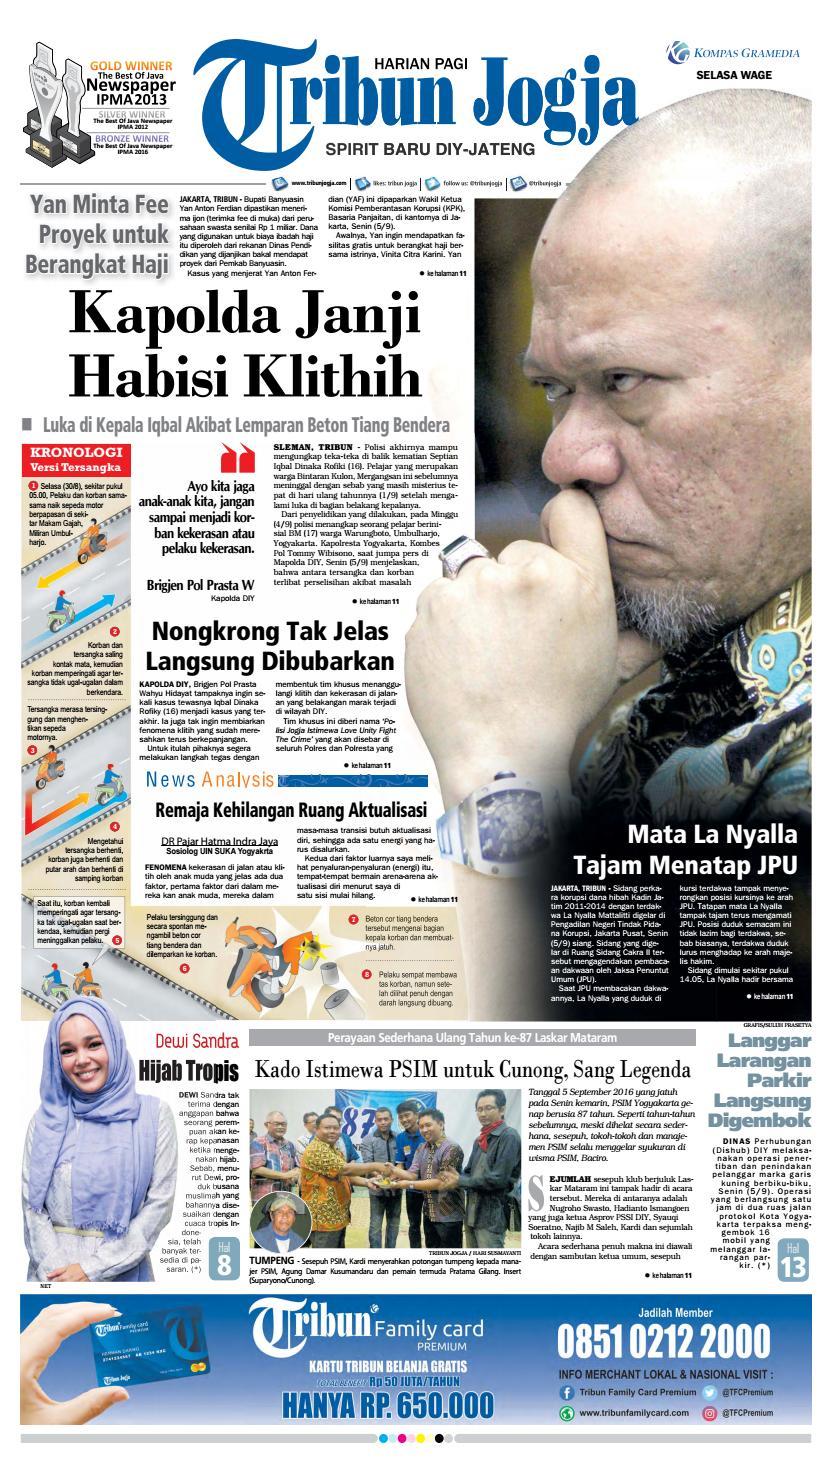 Tribunjogja 06 09 2016 By Tribun Jogja Issuu Produk Ukm Bumn Batik Tulis Warna Alam Ra Ampamp